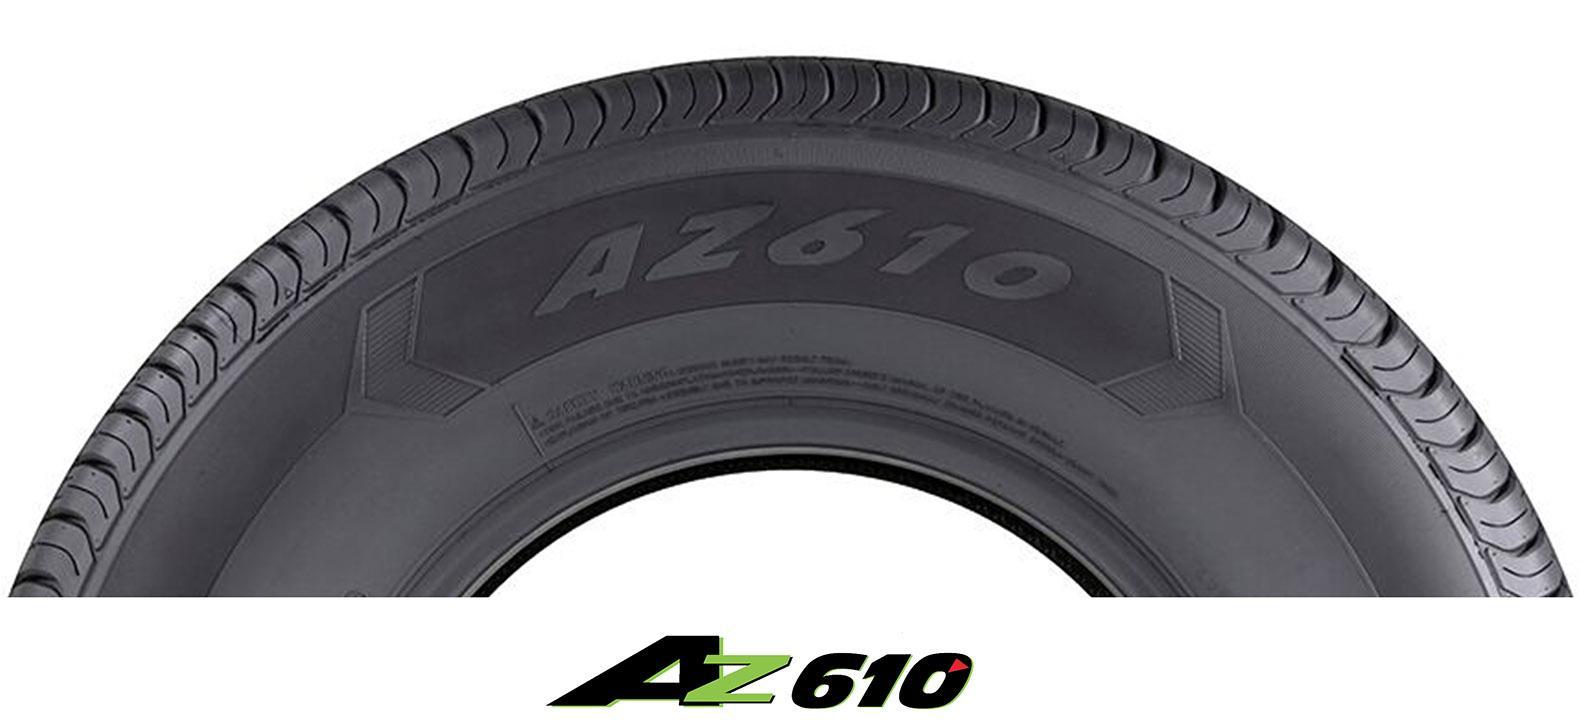 Atturo Tire представила новую всесезонную SUV-шину AZ610